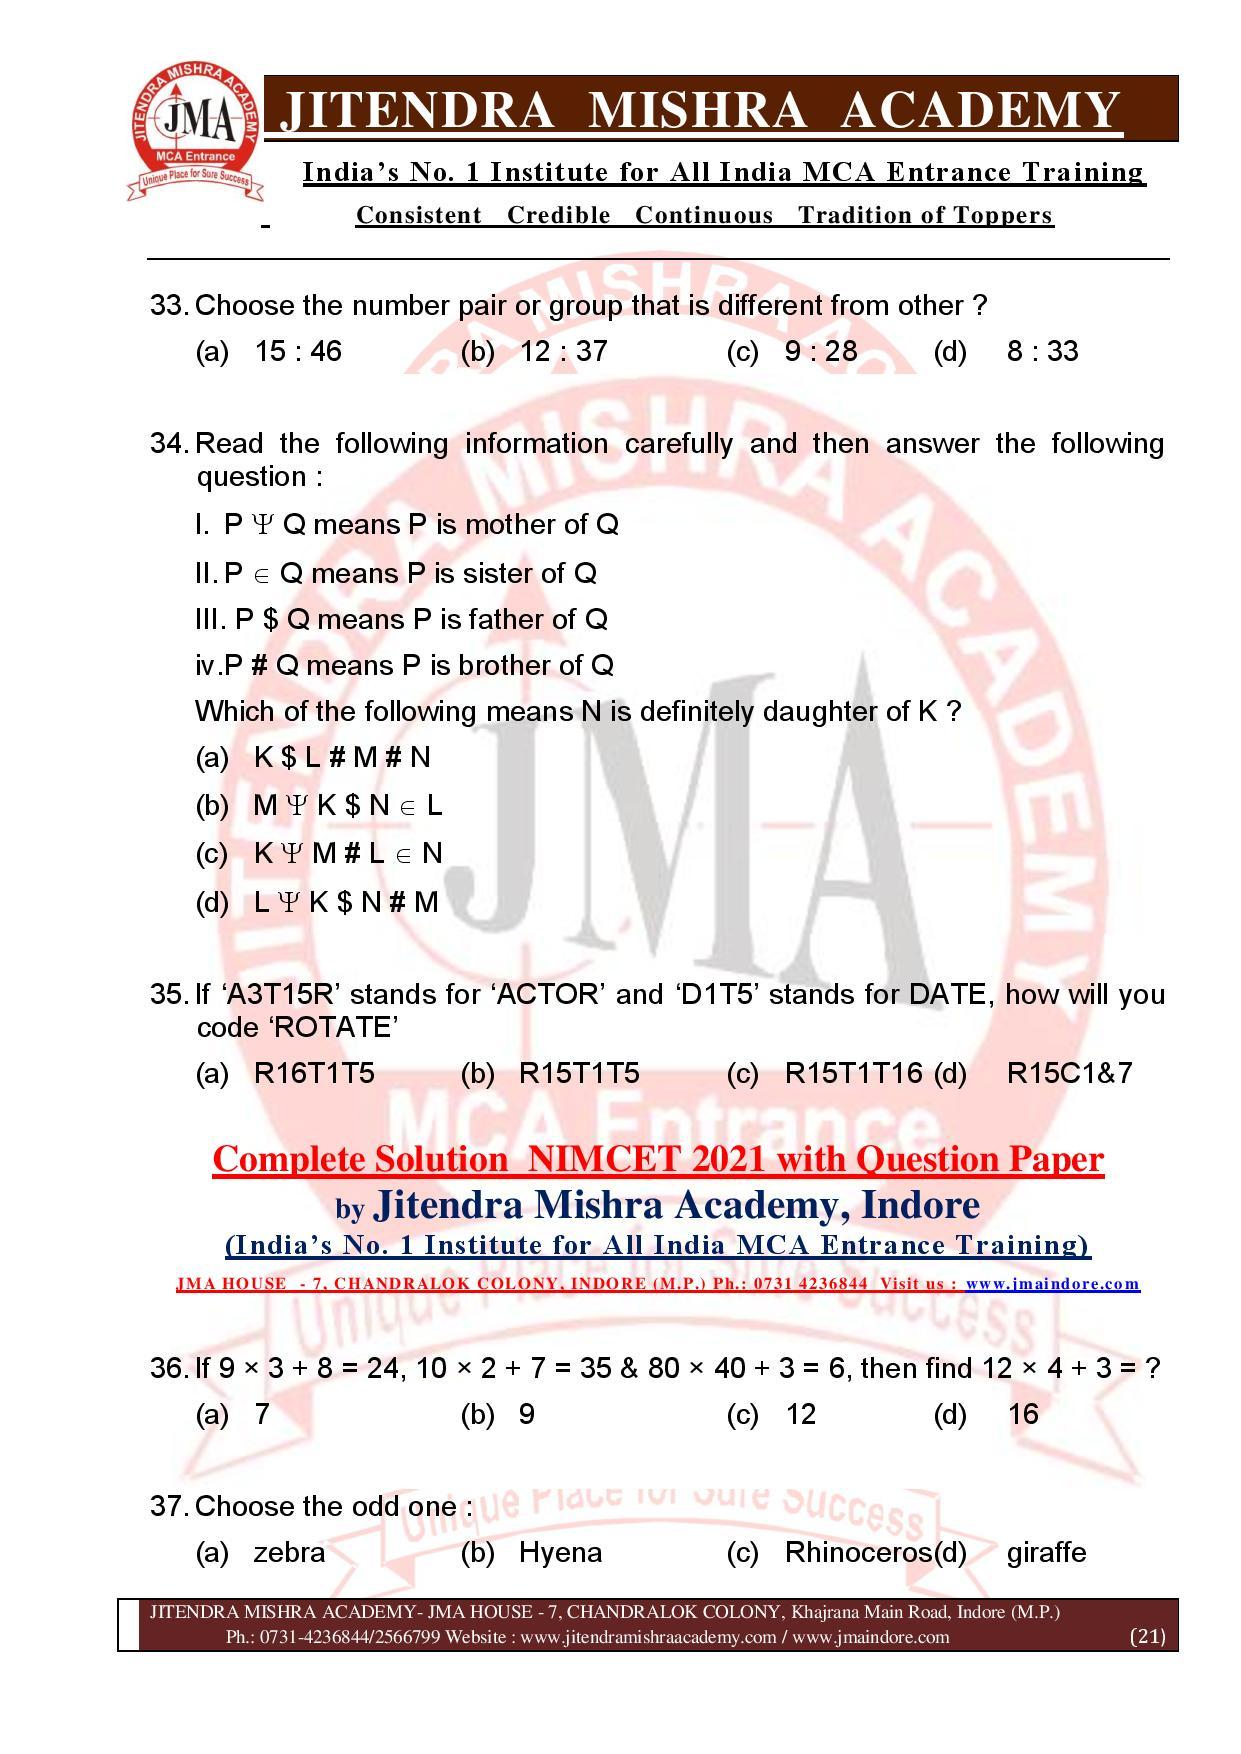 NIMCET 2021 QUESTION PAPER (F)-page-021